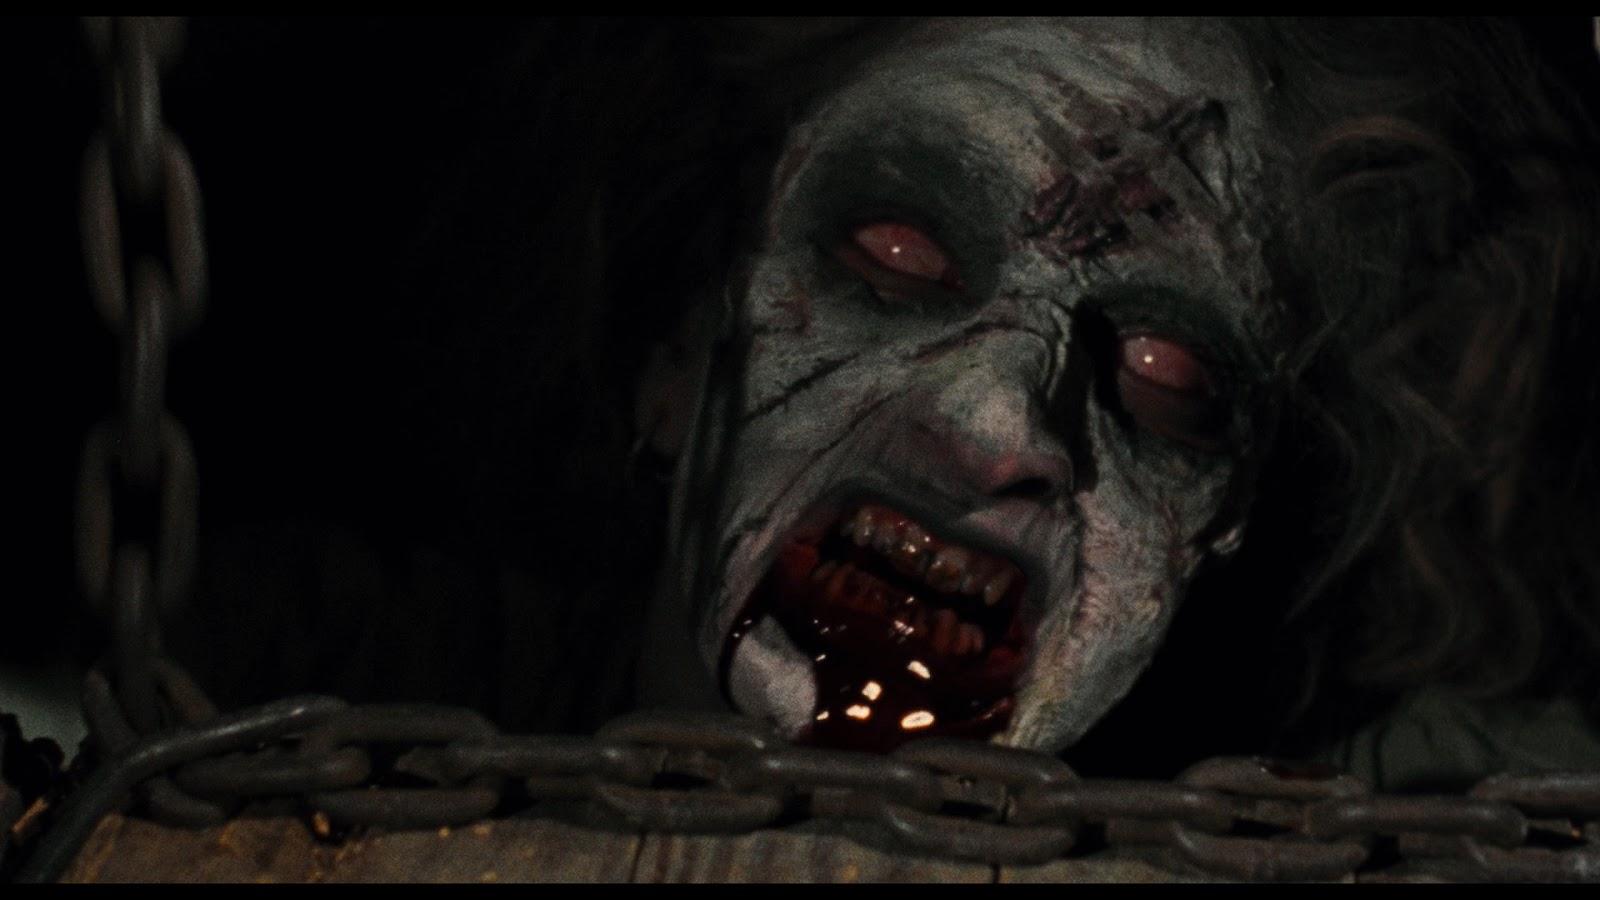 Evil Dead 2013 Chainsaw To The Face Wallpaper Evil dead